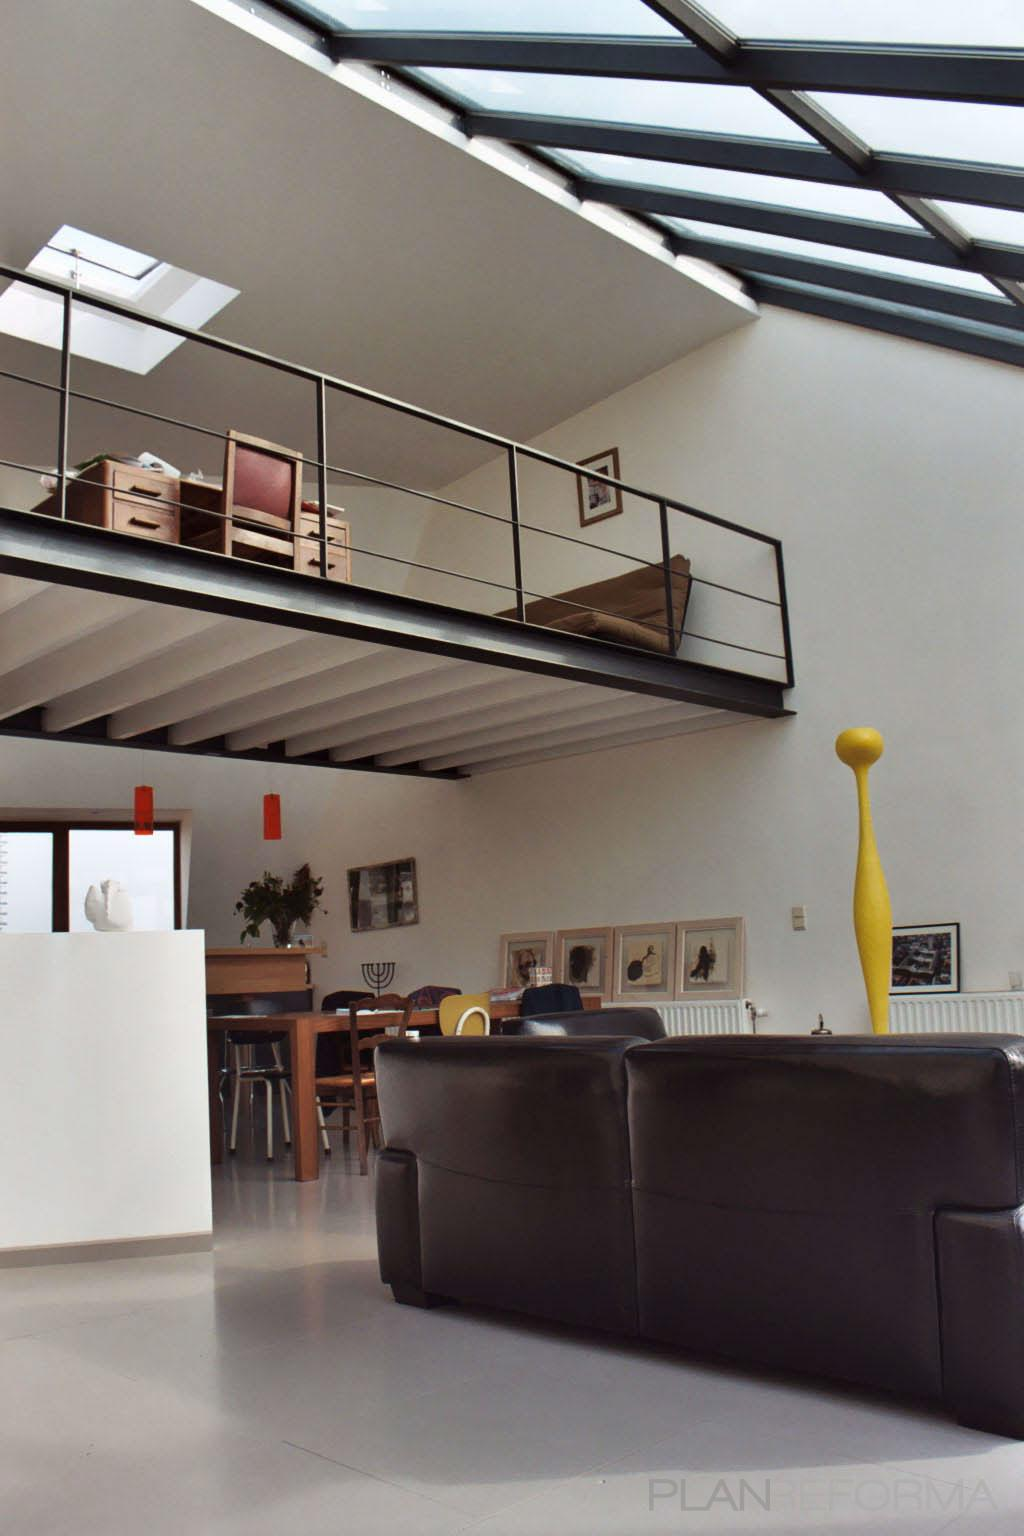 Comedor, Salon, Oficina Estilo contemporaneo Color blanco, gris, negro  diseñado por ONYON huerto creativo   Arquitecto   Copyright ONYON huerto creativo